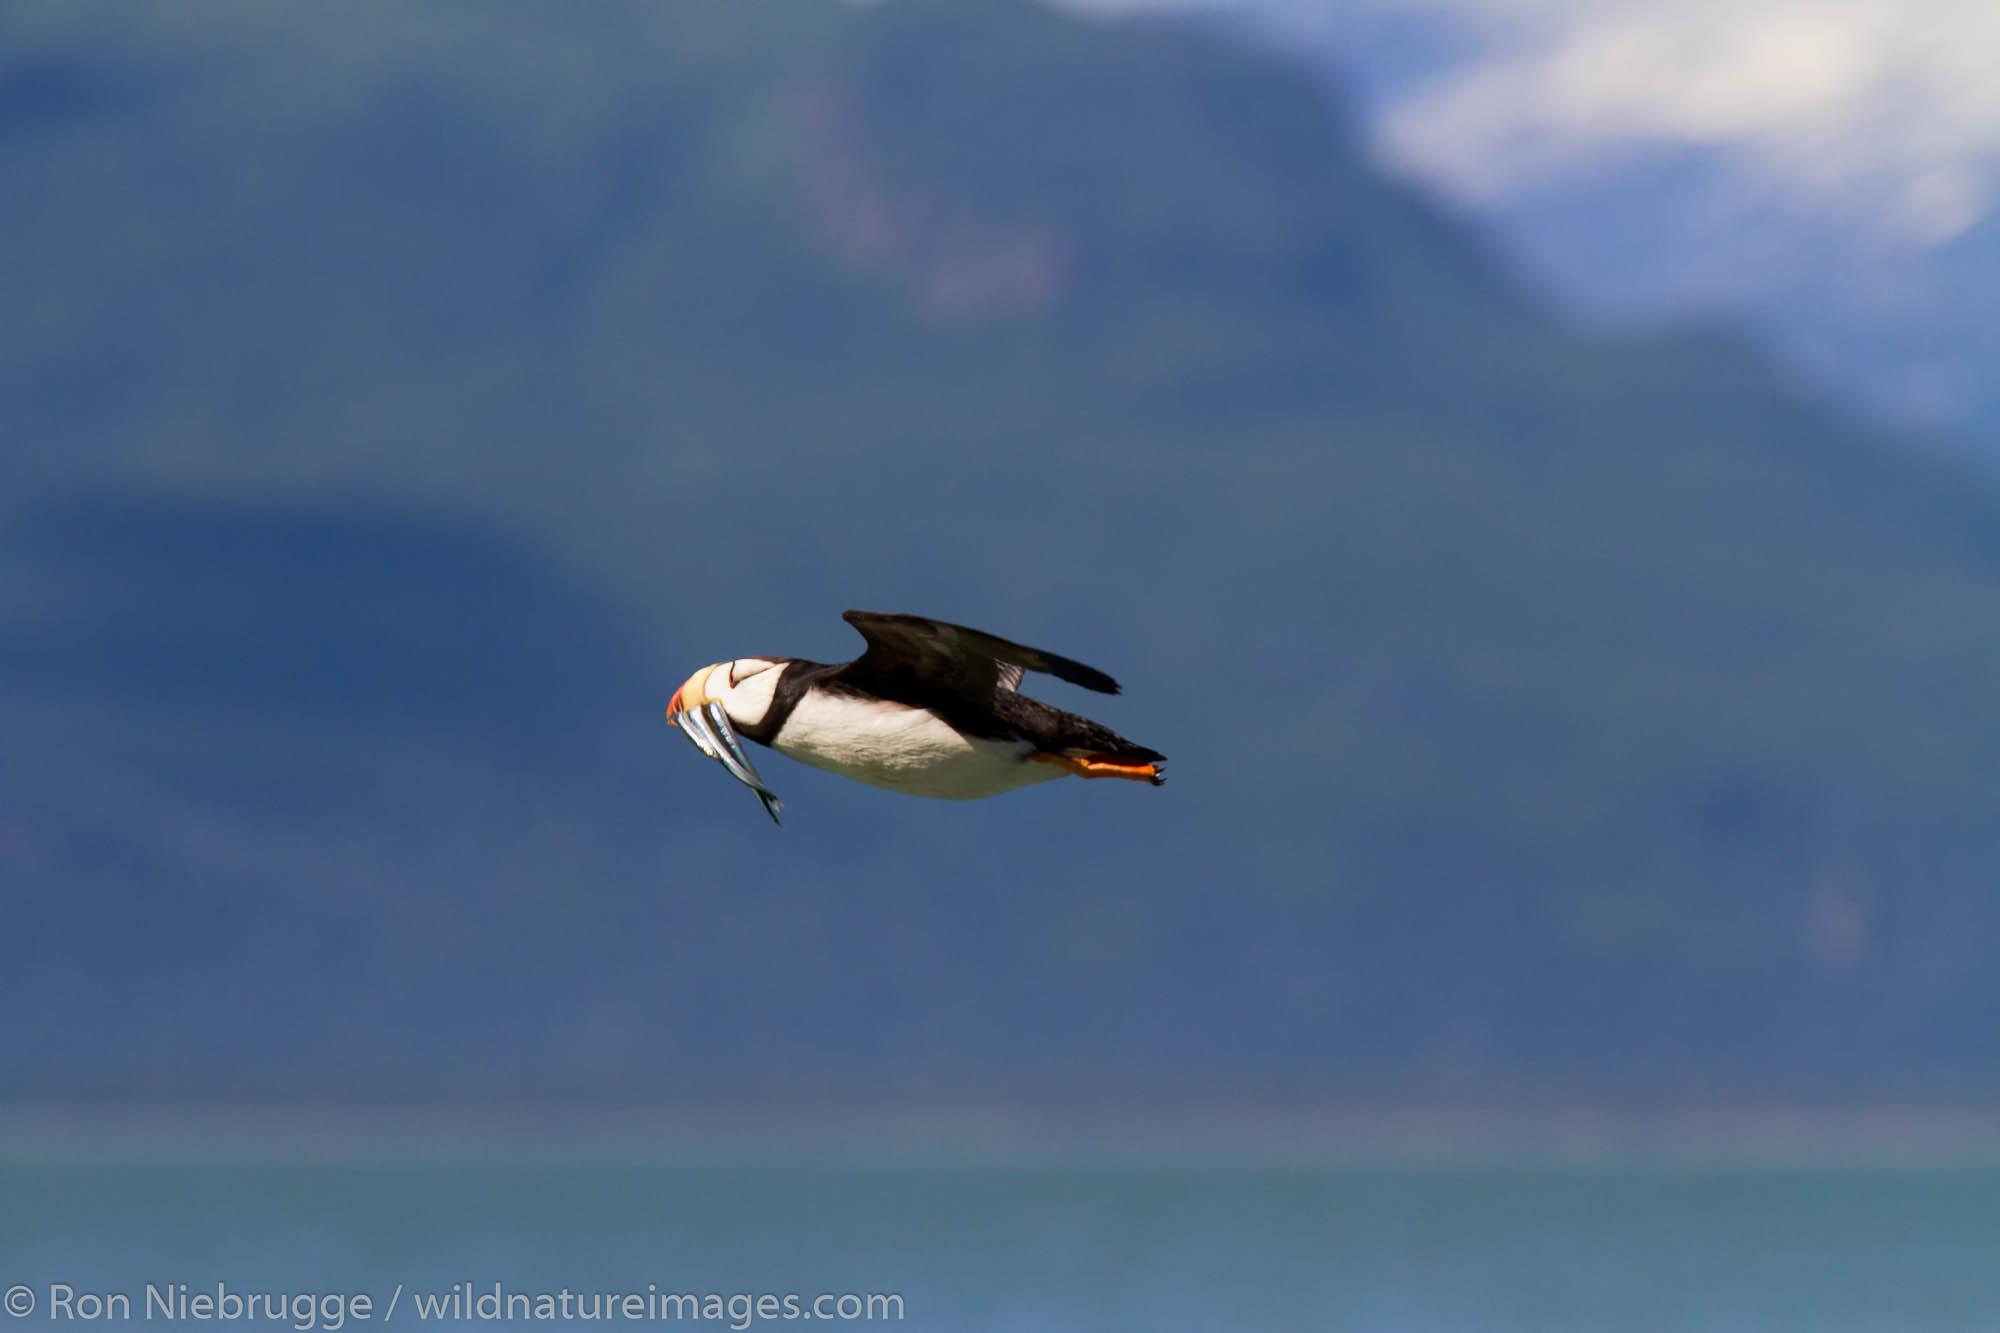 Horned puffin in flight, near Lake Clark National Park, Alaska.